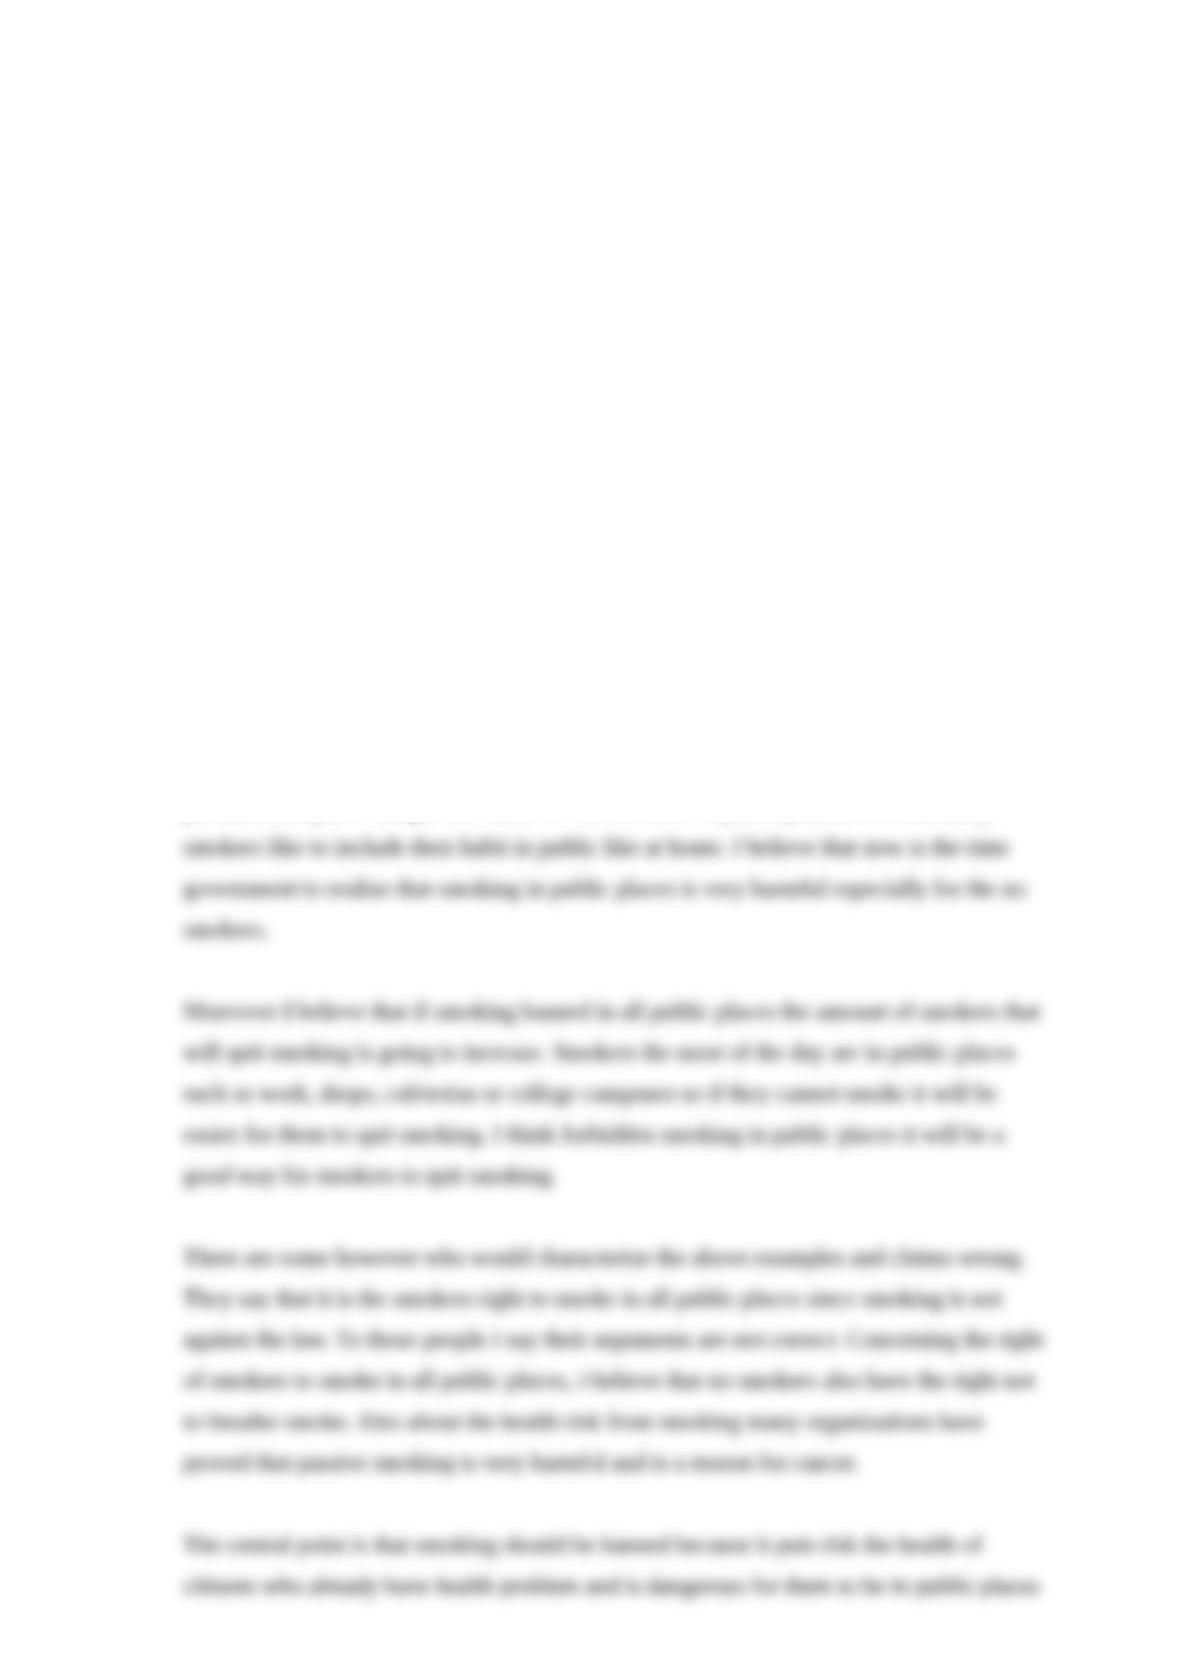 Vonnegut 8 basics creative writing